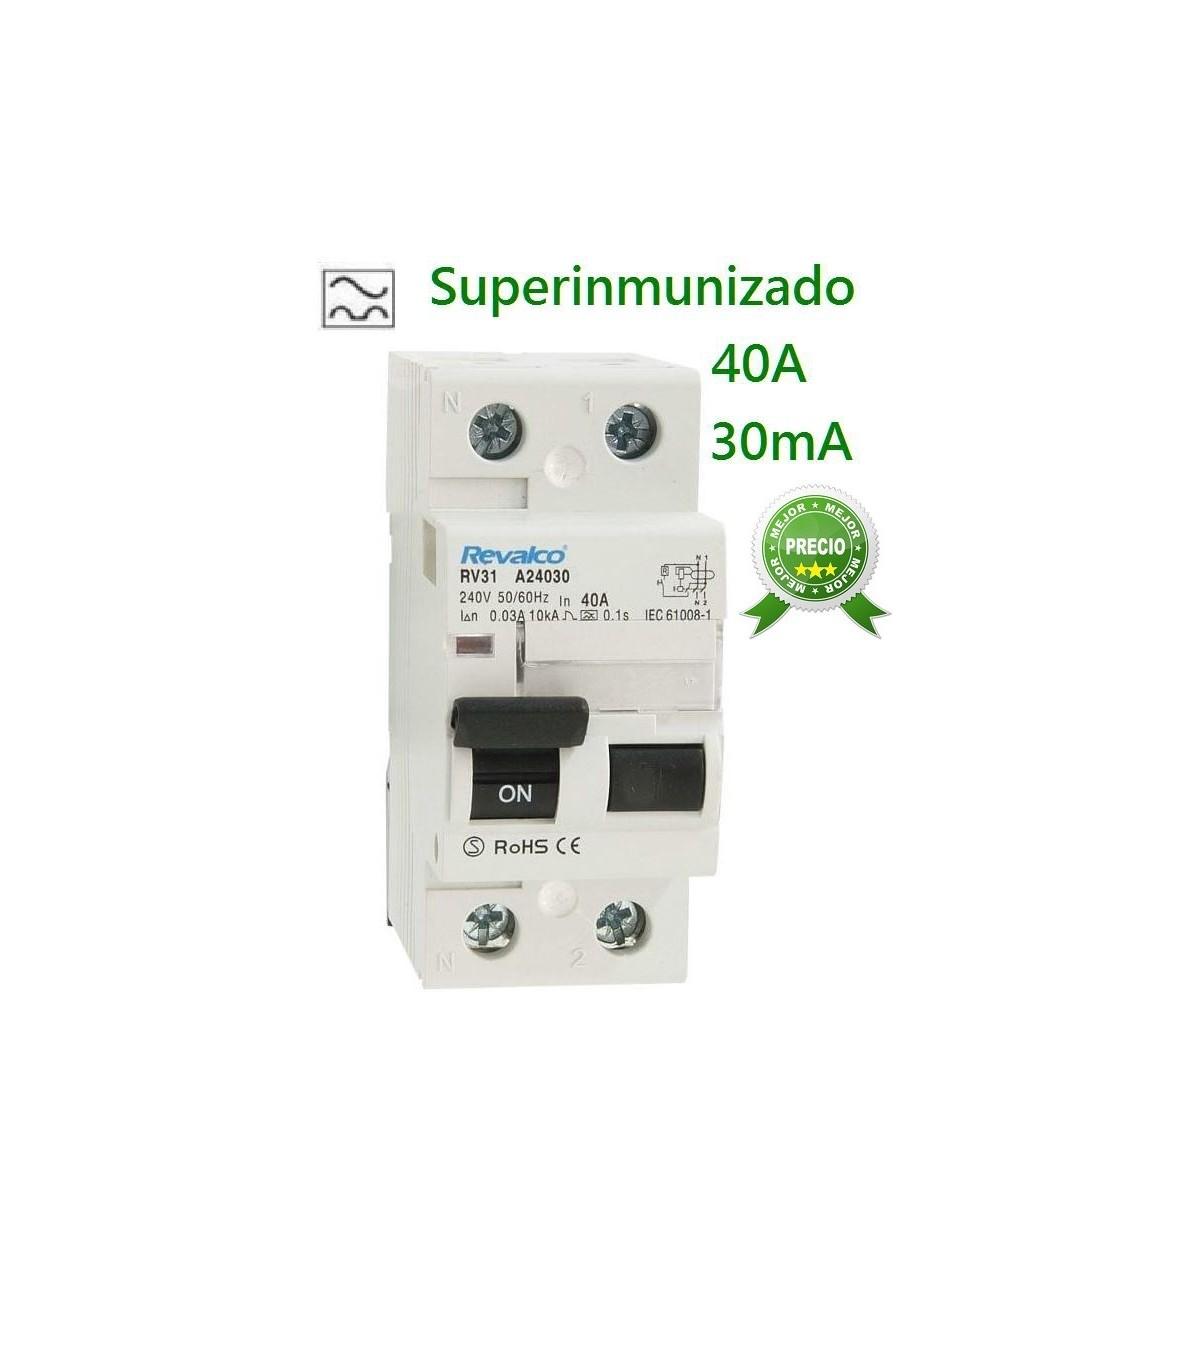 Interruptor diferencial superinmunizado 40 A 30 mA 2P Clase A Si y 10kA.